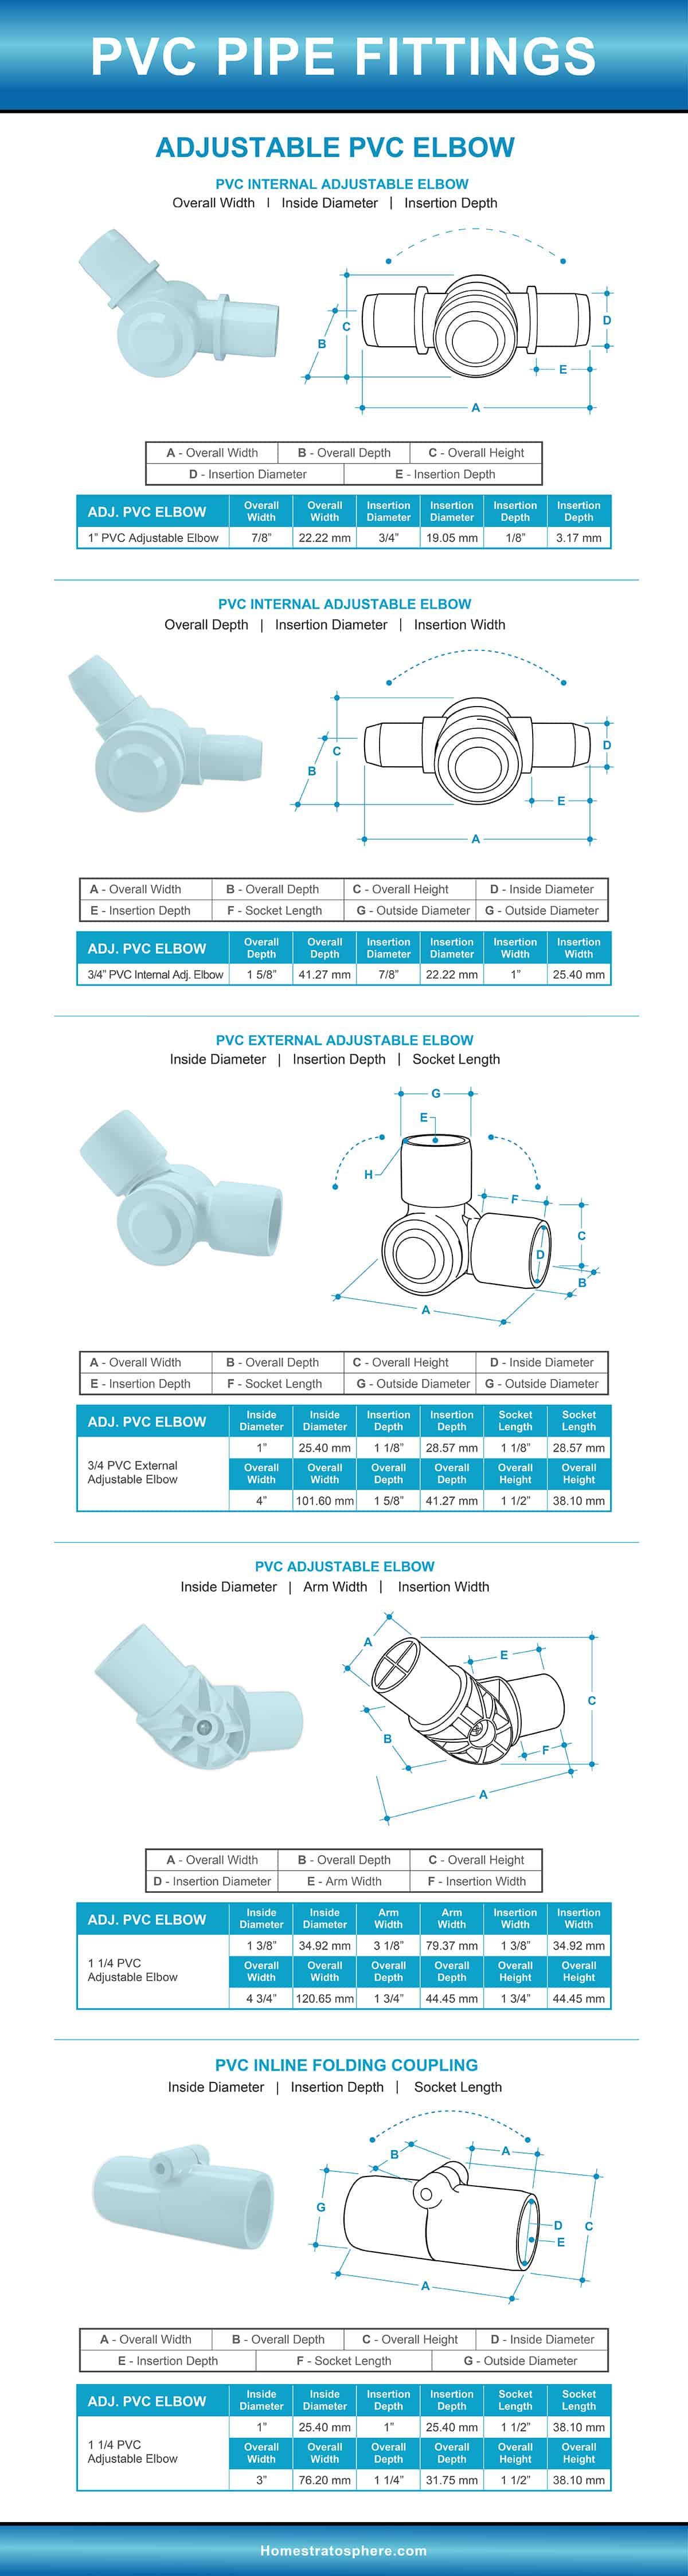 Adjustable PVC Elbow Illustration and Sizes Chart